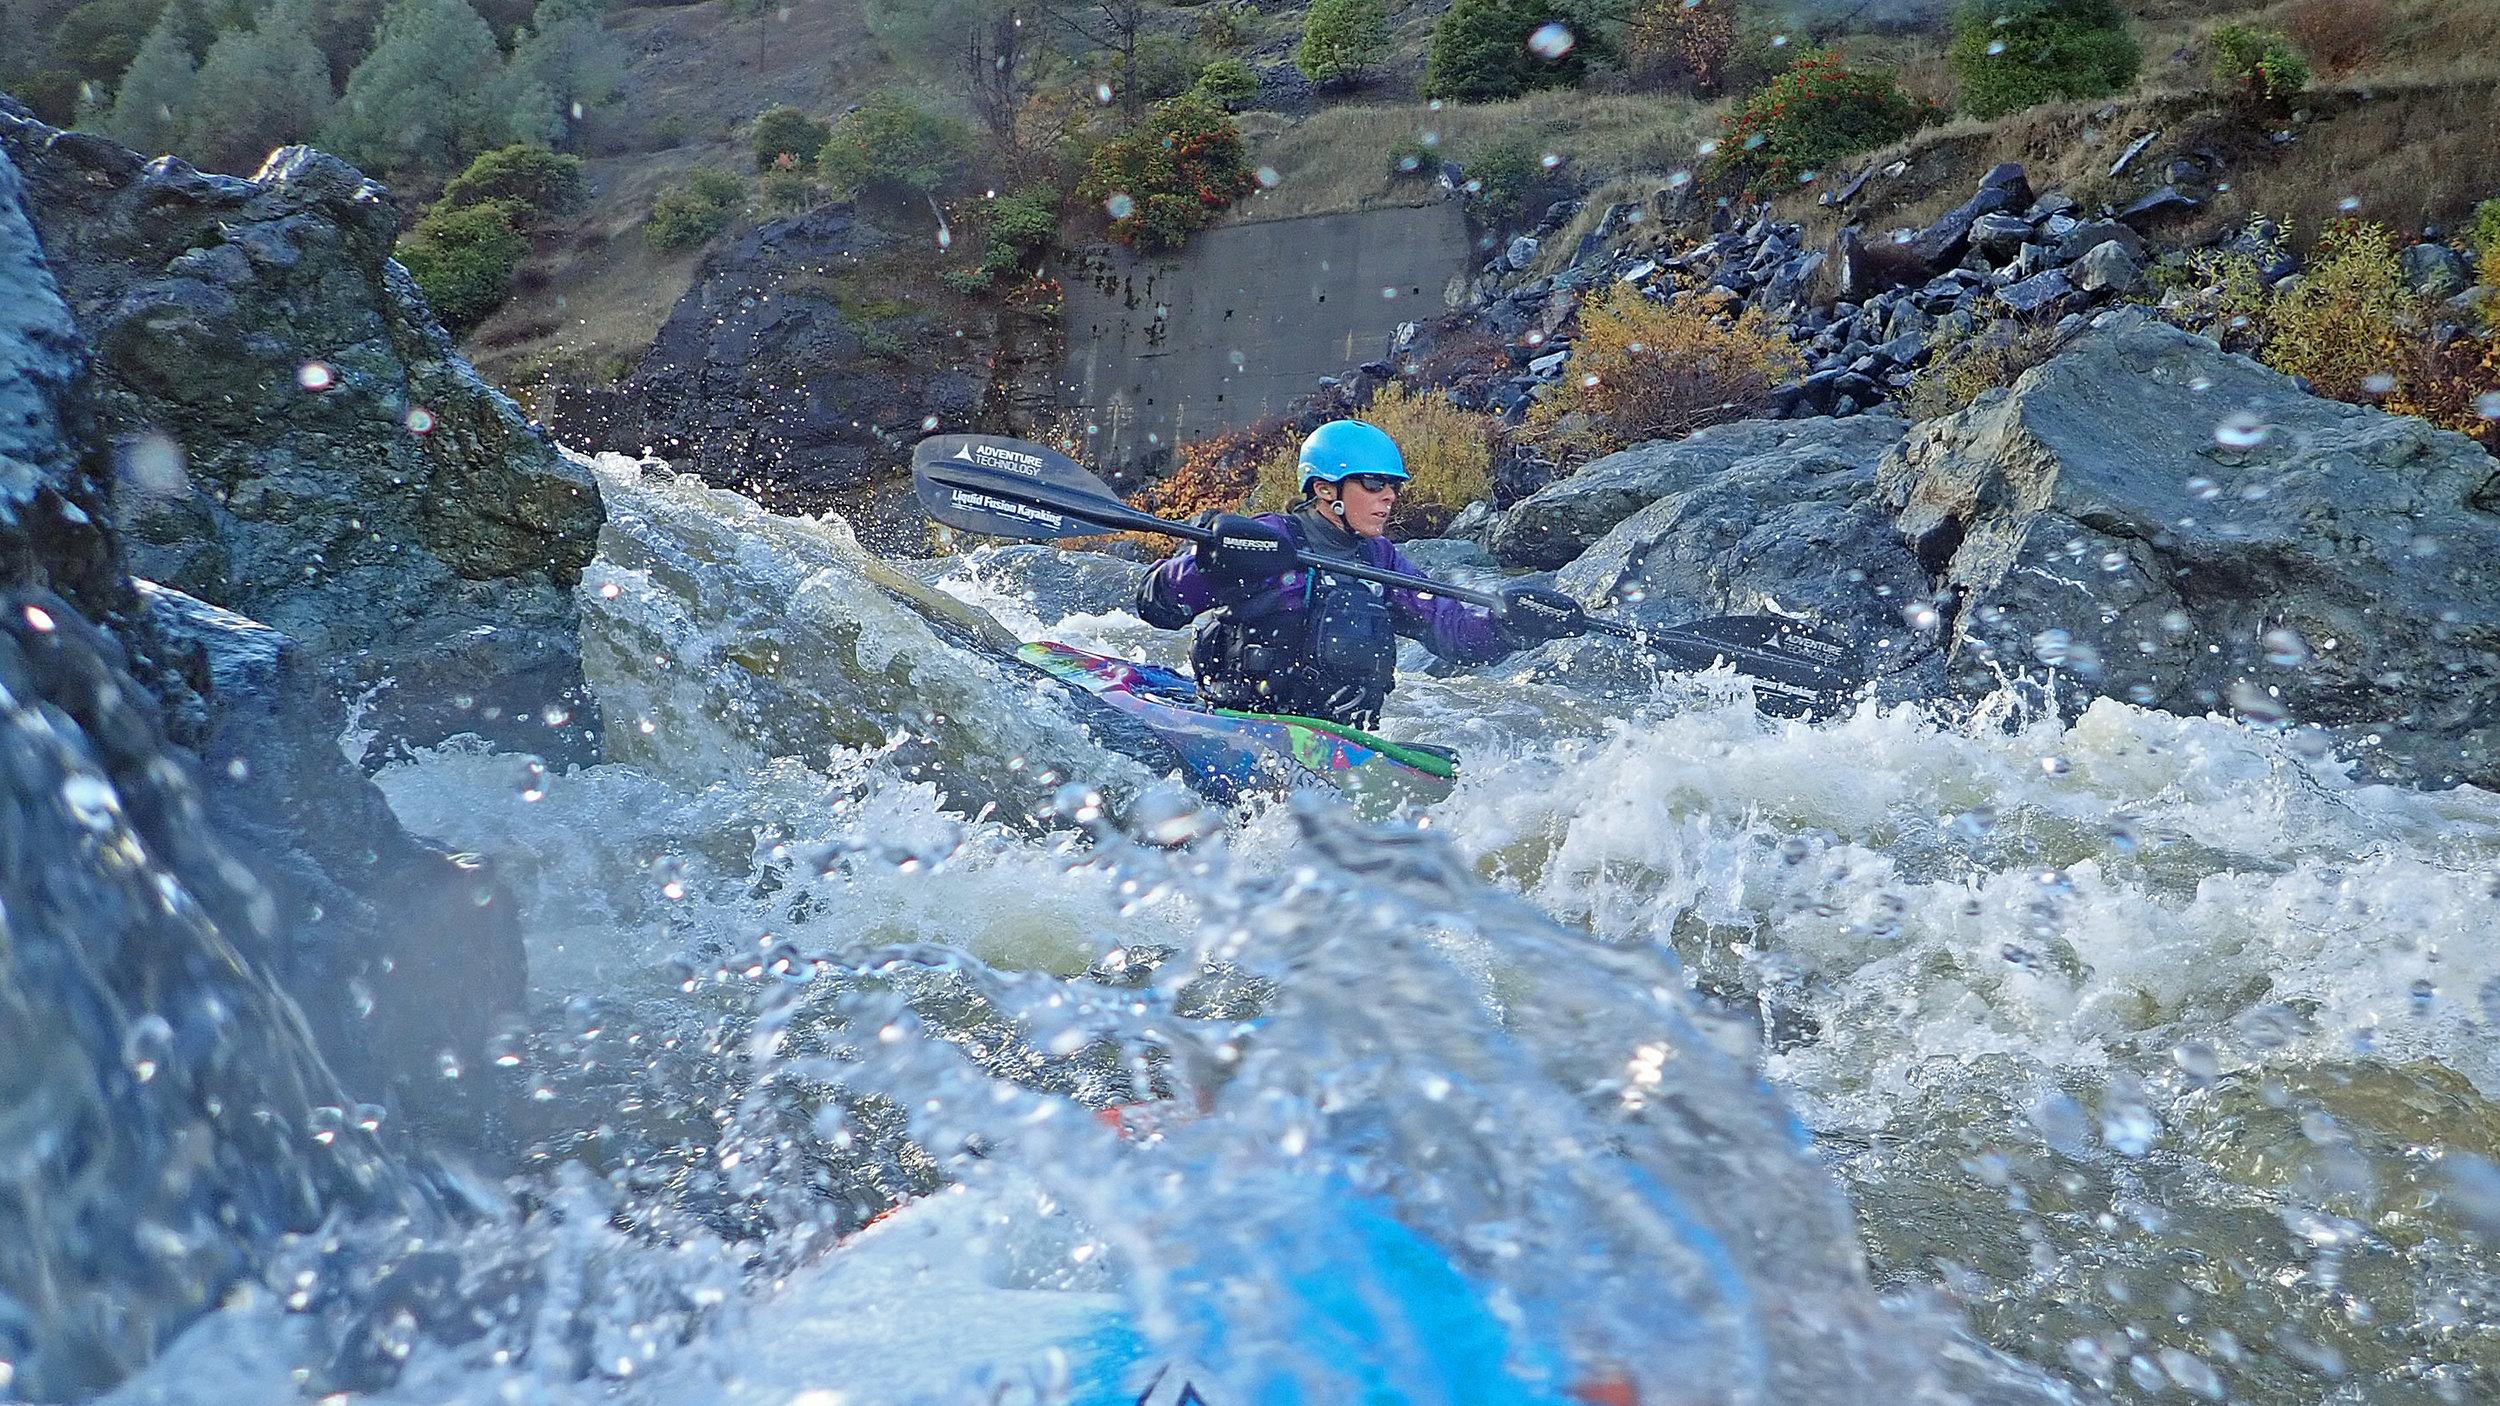 Whitewater kayaking on the Eel River. Photo courtesy of Liquid Fusion Kayaking.